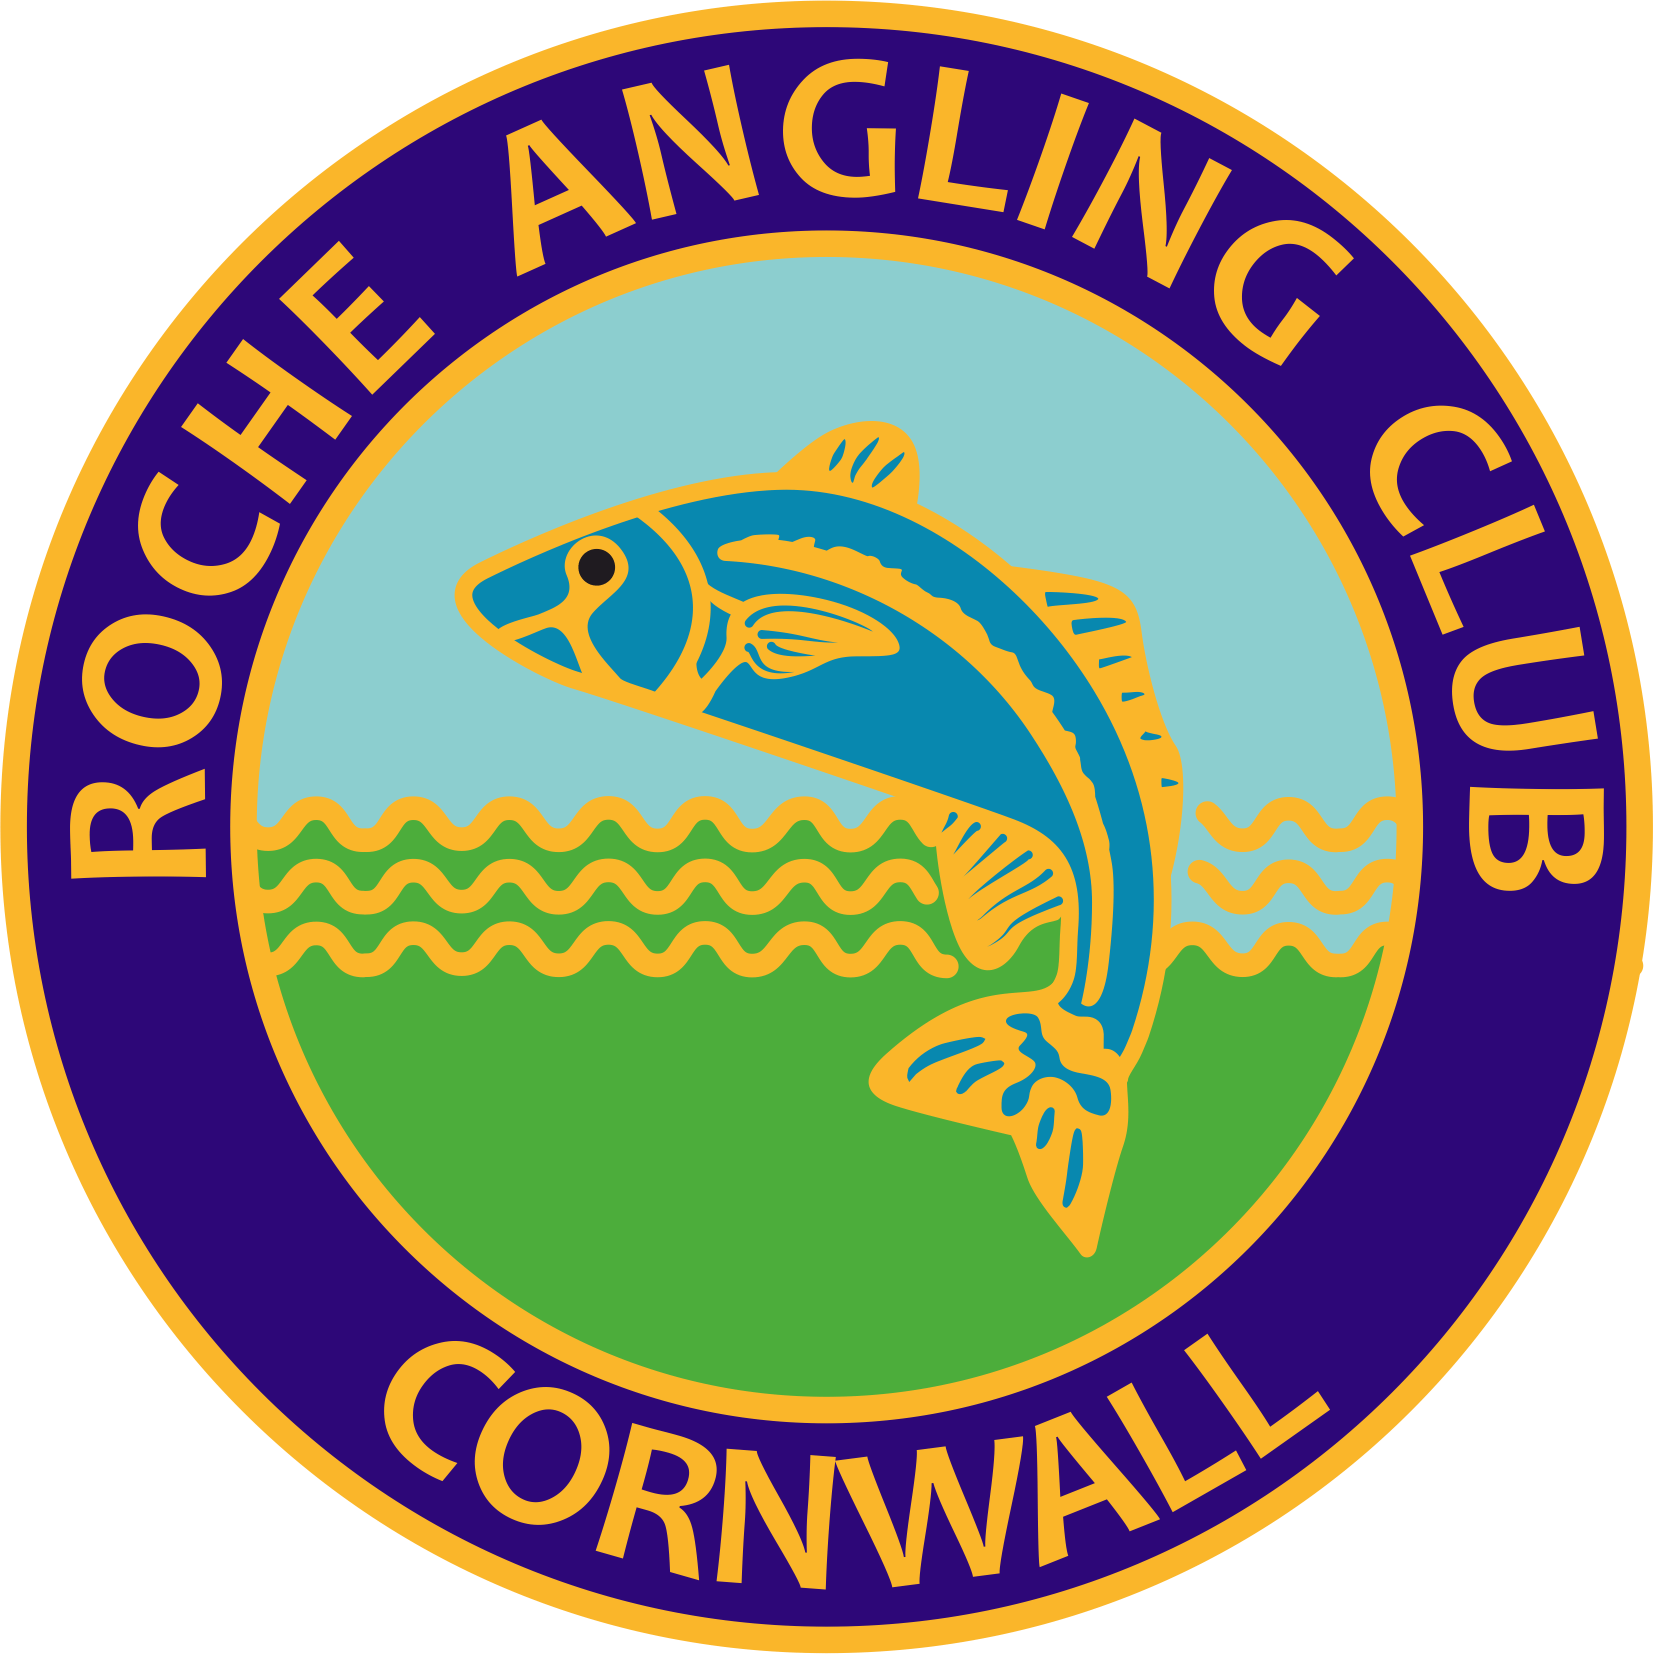 Roche Angling Club